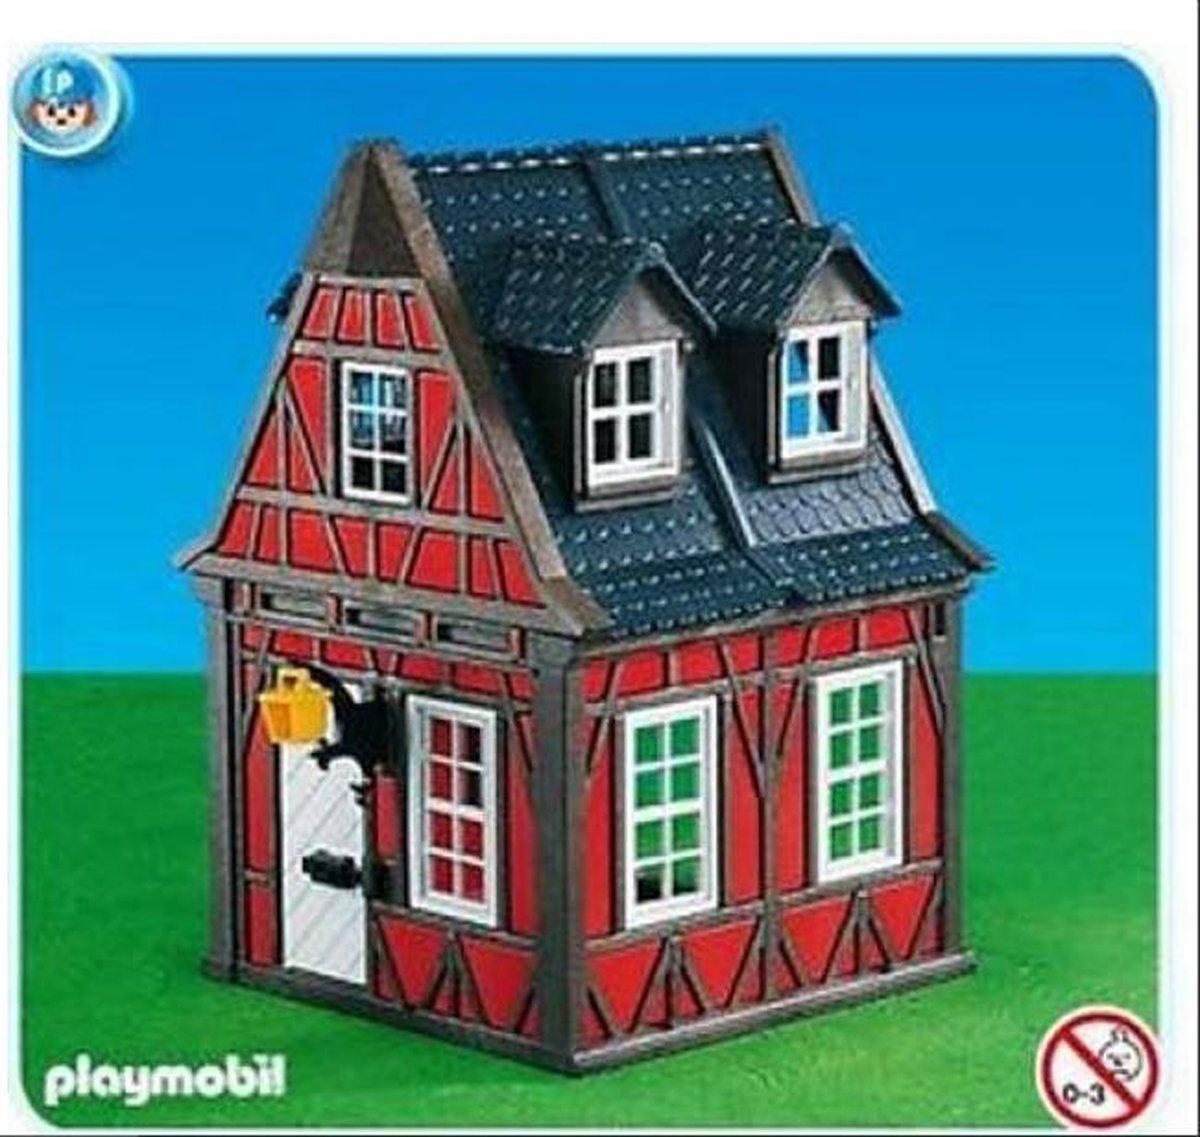 Playmobil vakwerkhuis Middeleeuws